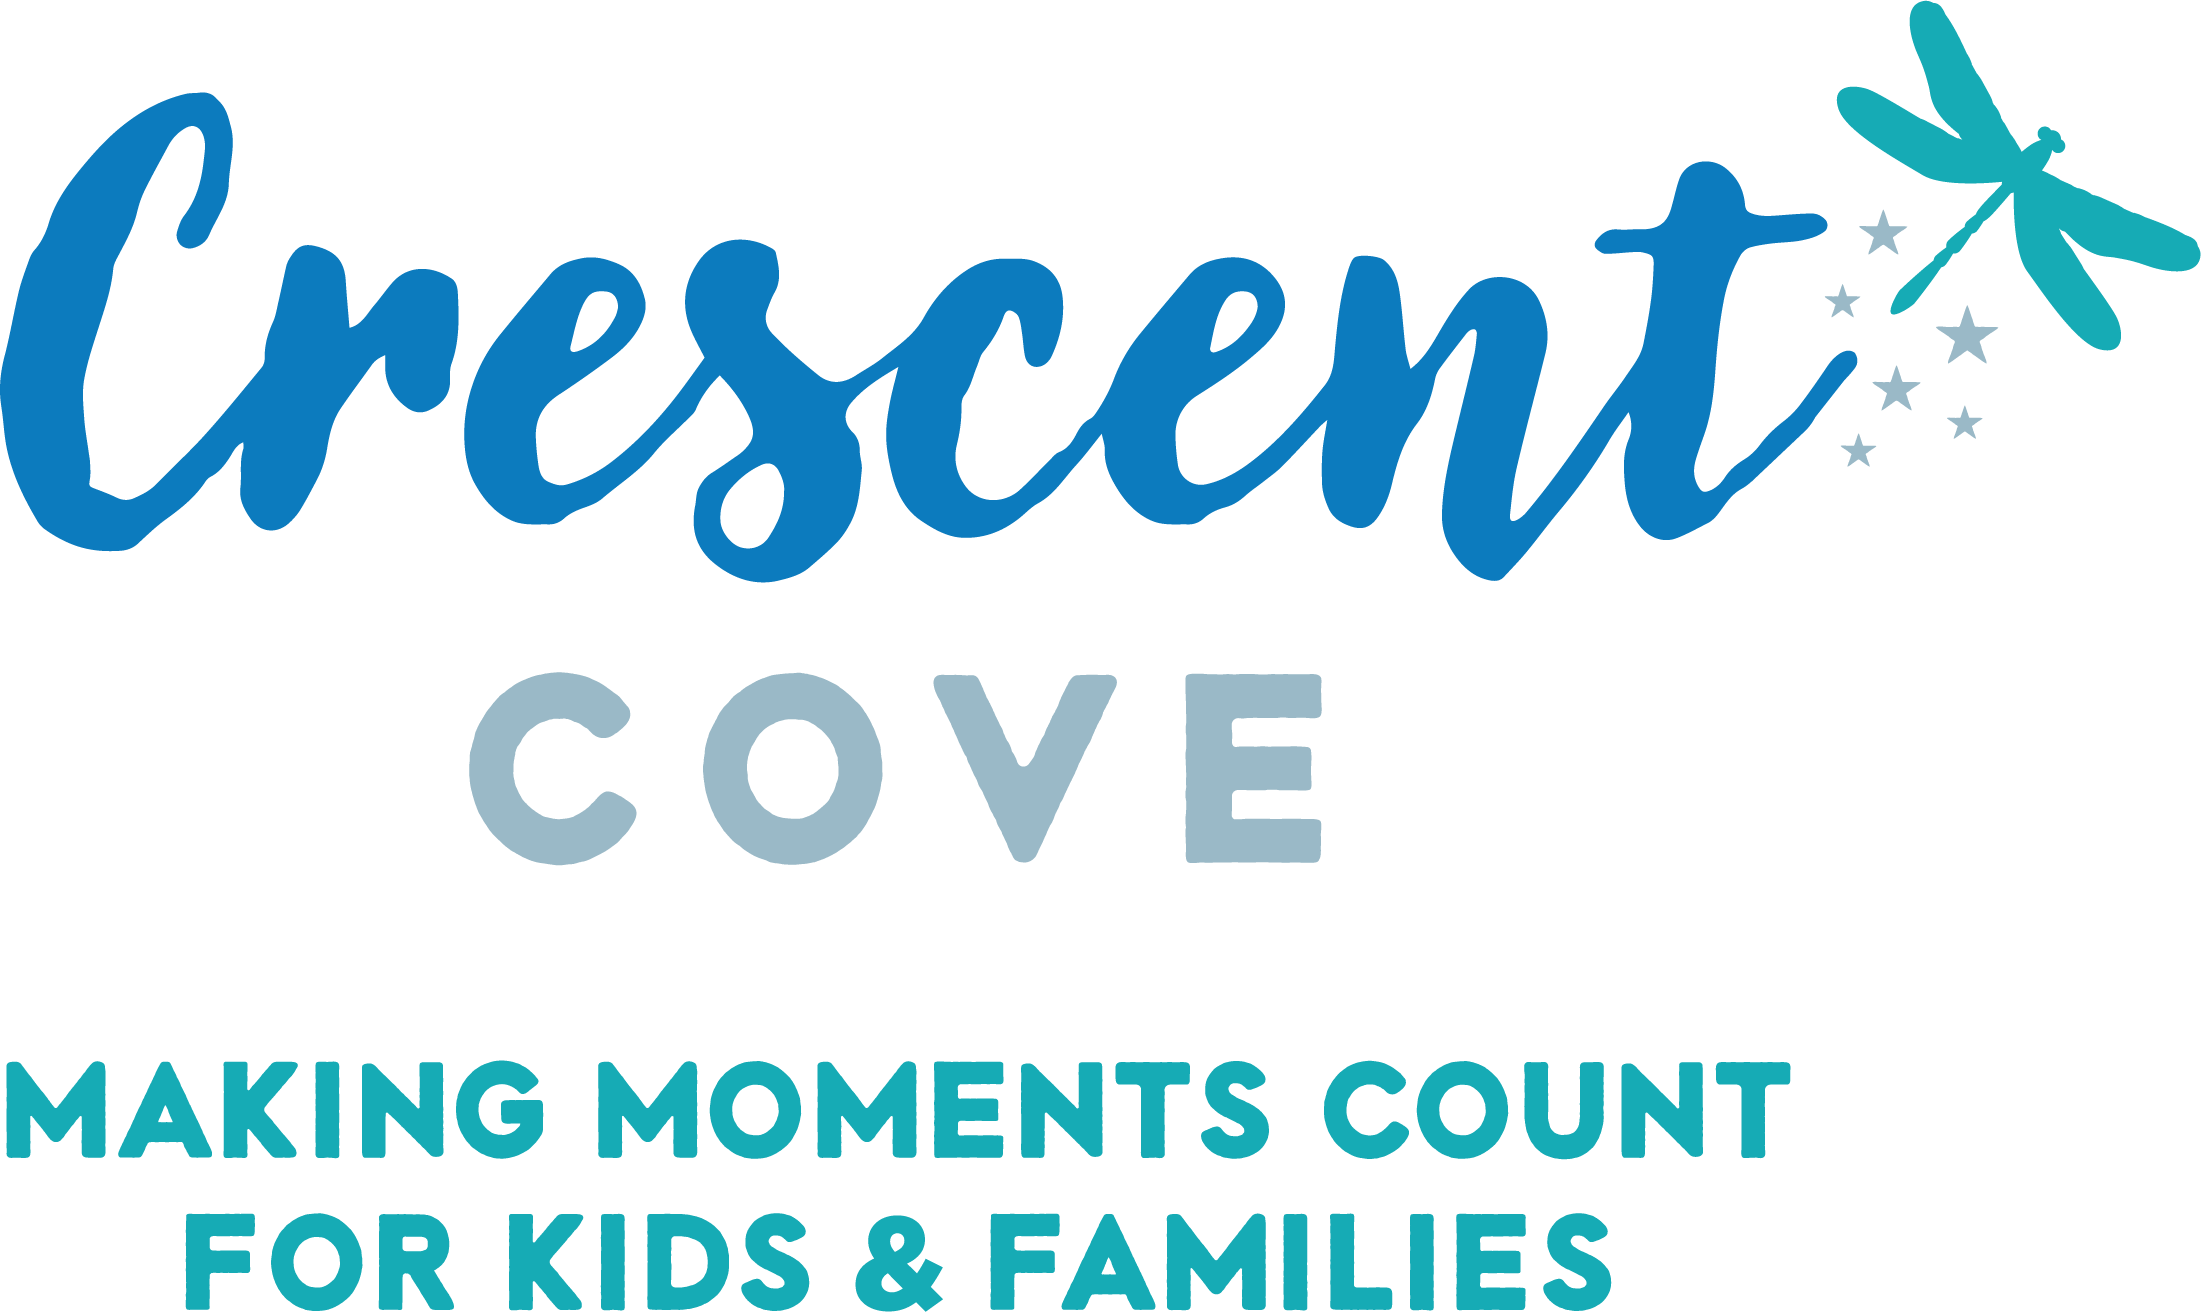 CrescentCove_LogoTagline_V_FullColor.png